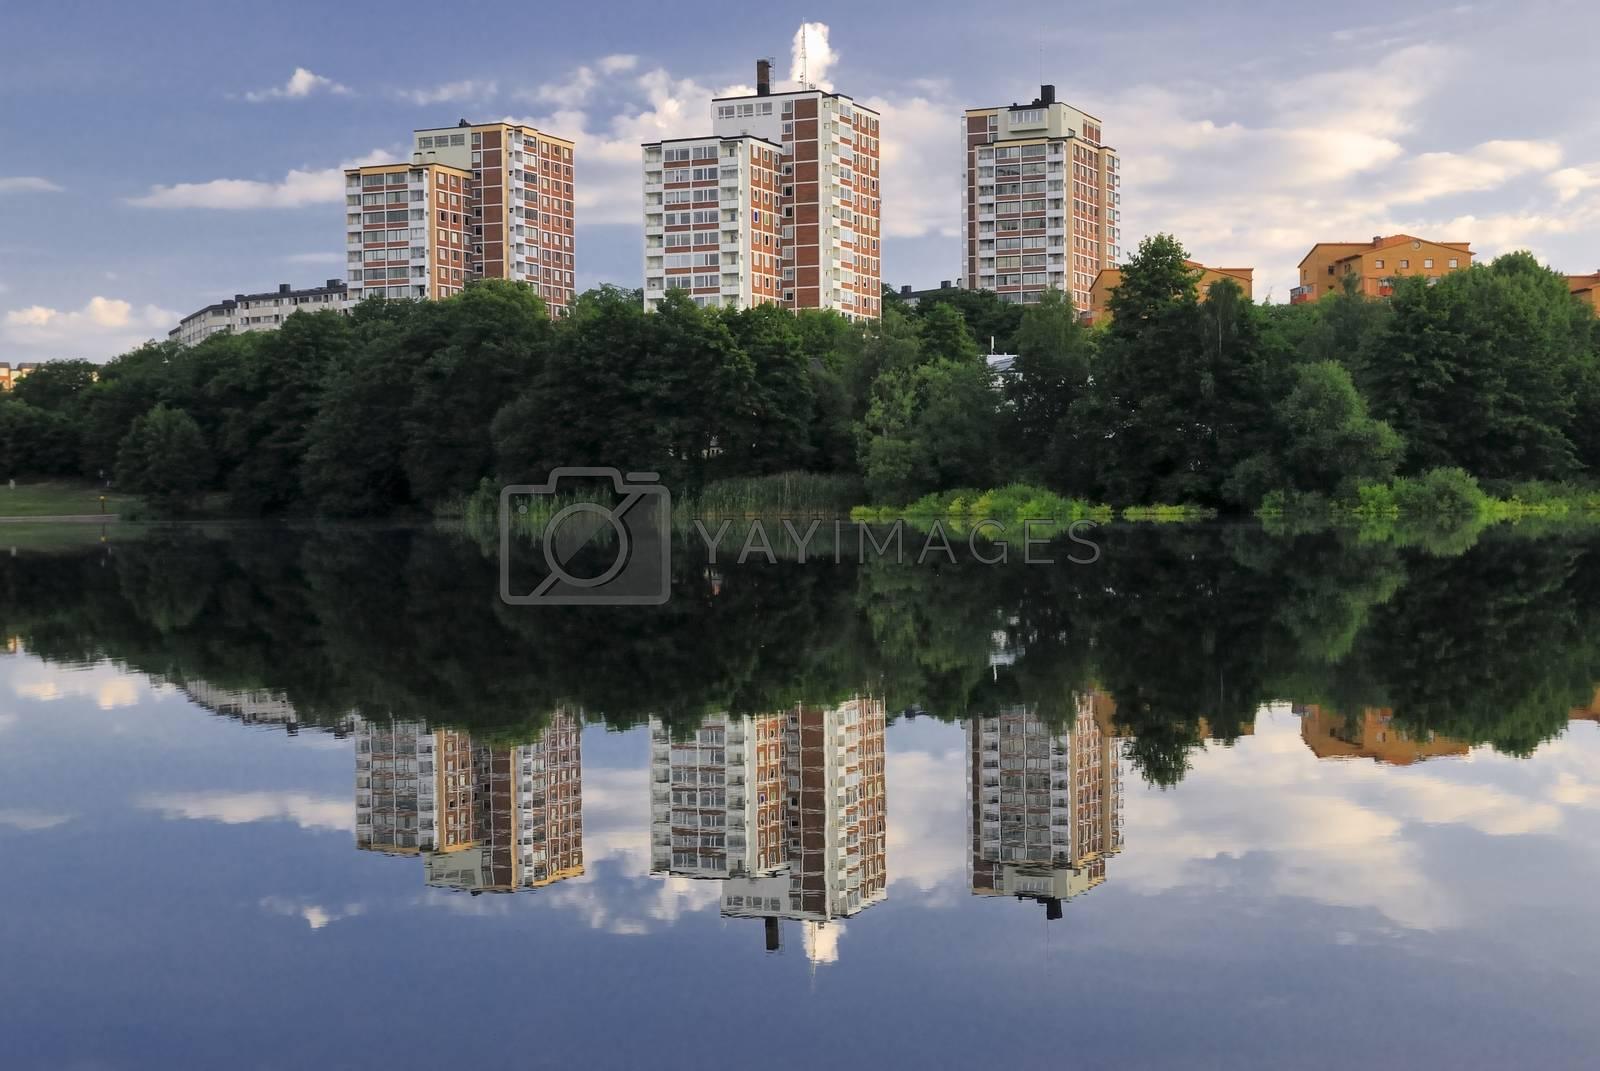 "Residential builduings near a lake ""Trekanten"" in Stockholm - Sweden.        Residential builduings near a lake"